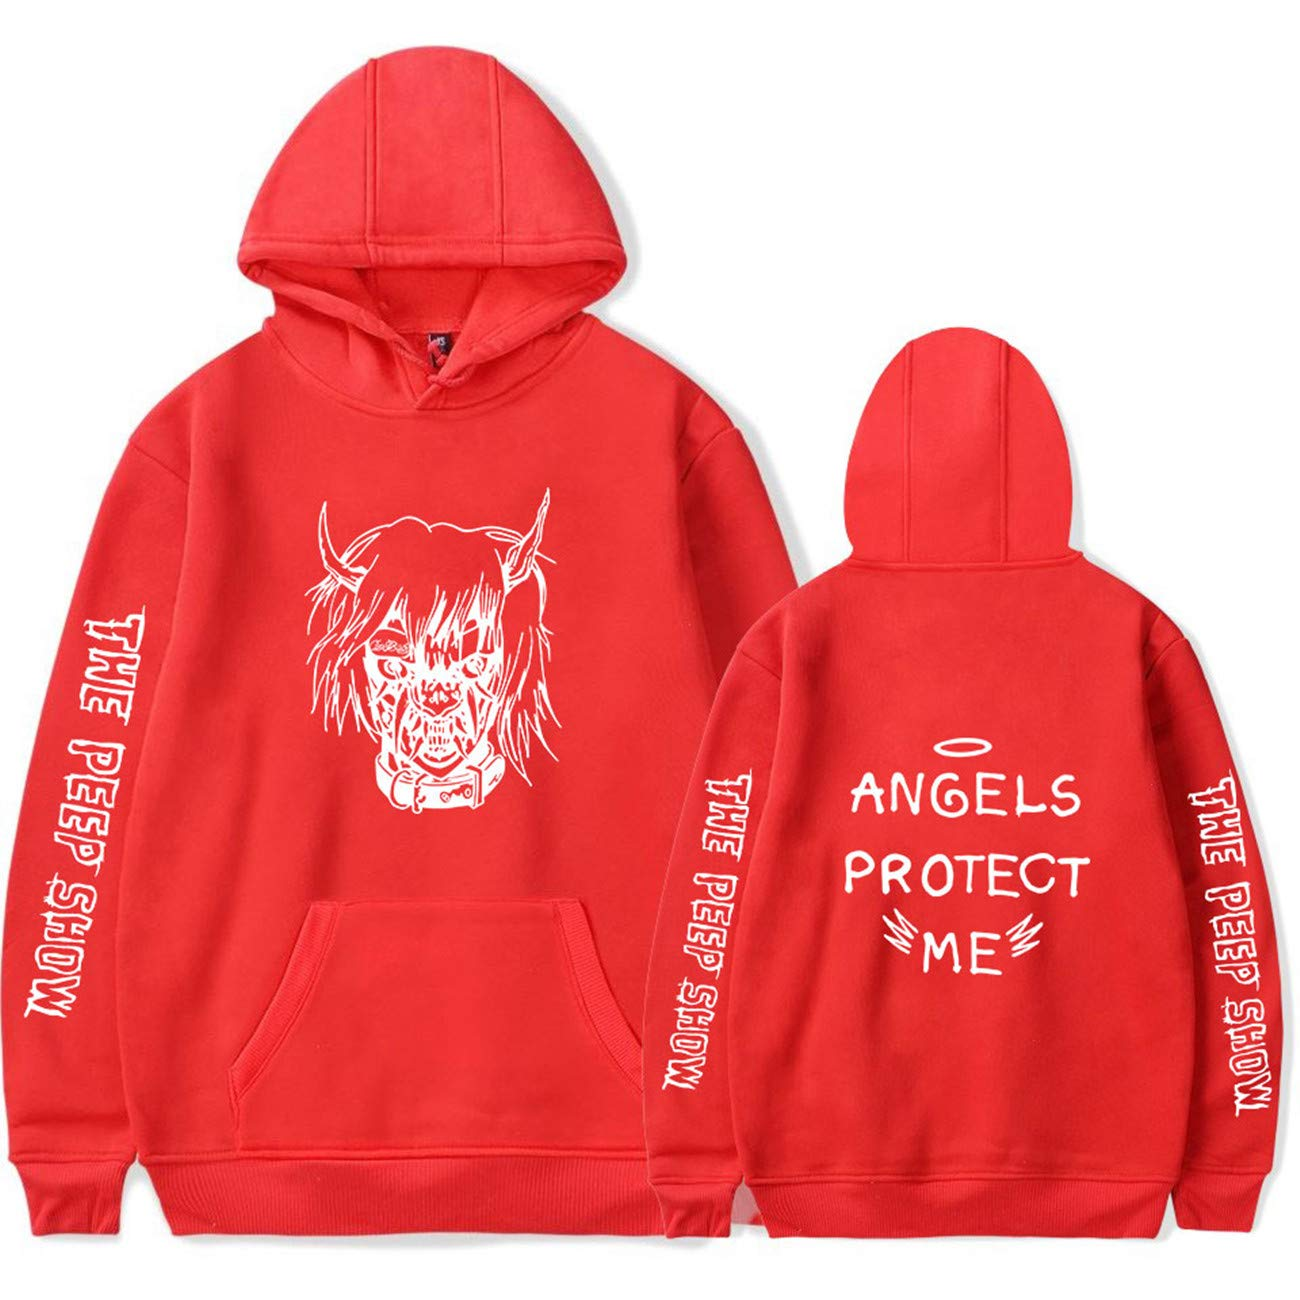 SERAPHY Unisex R.I.P Lil Peep Rapper Hip Hop Sweatshirts Hoodie Print Clothes LP-9995-DM-CA